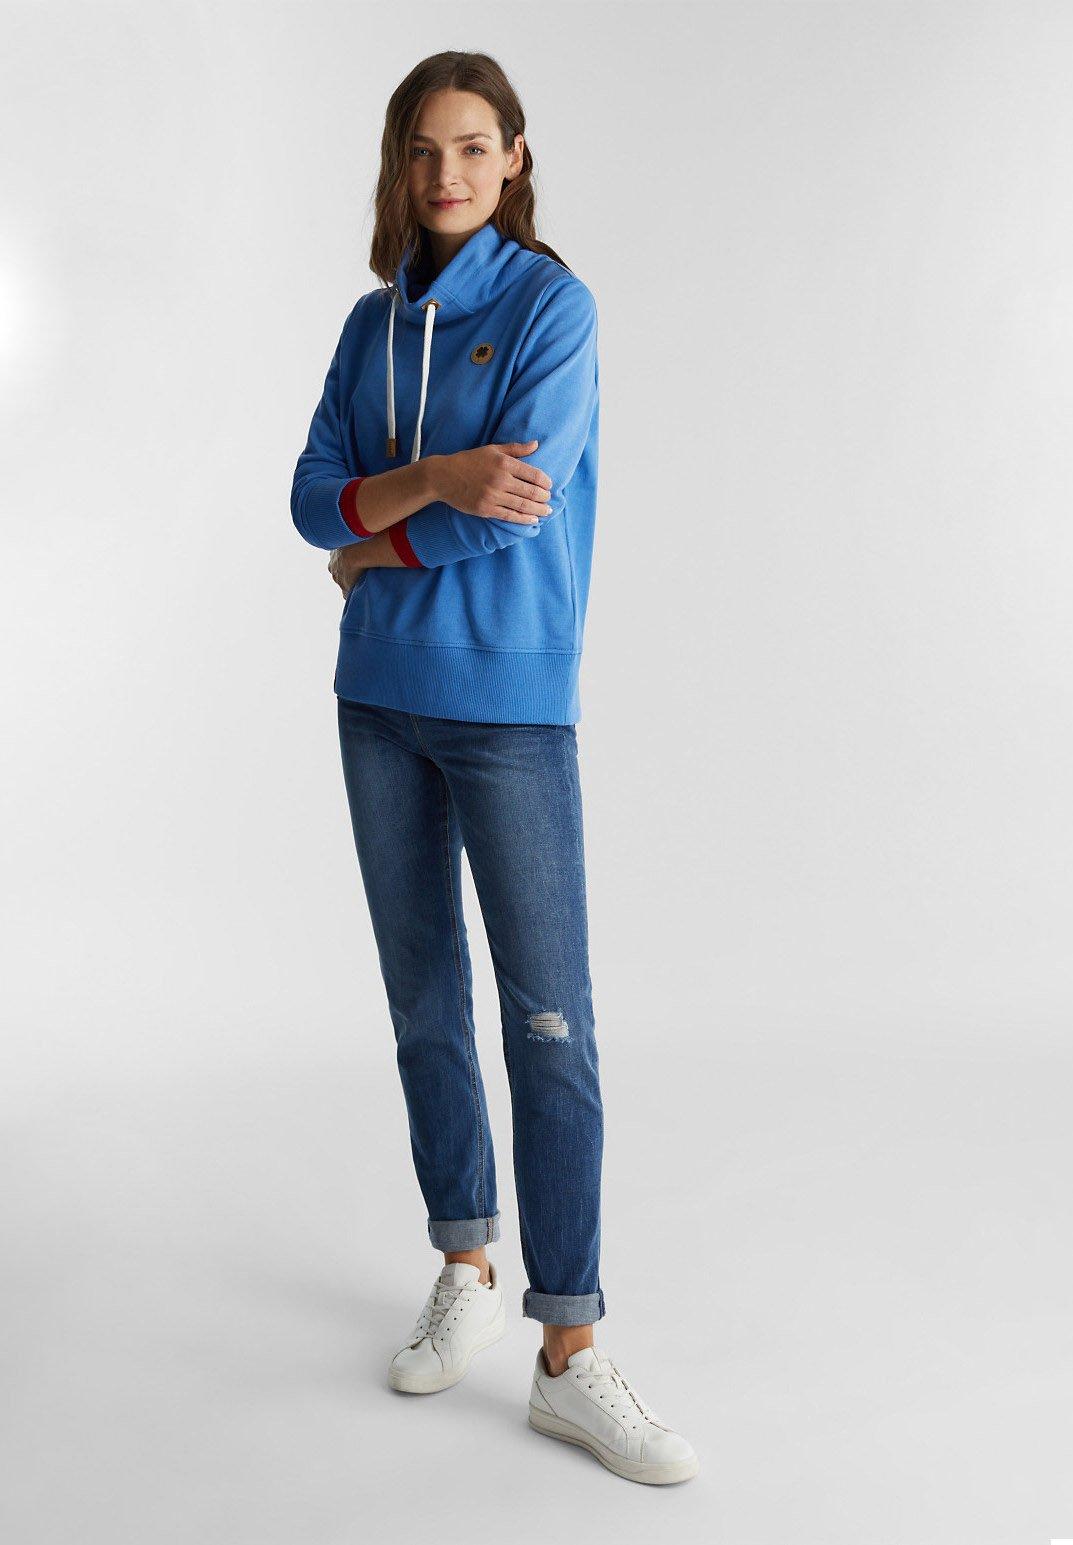 edc by Esprit Trui bright blueBlauw Zalando.nl